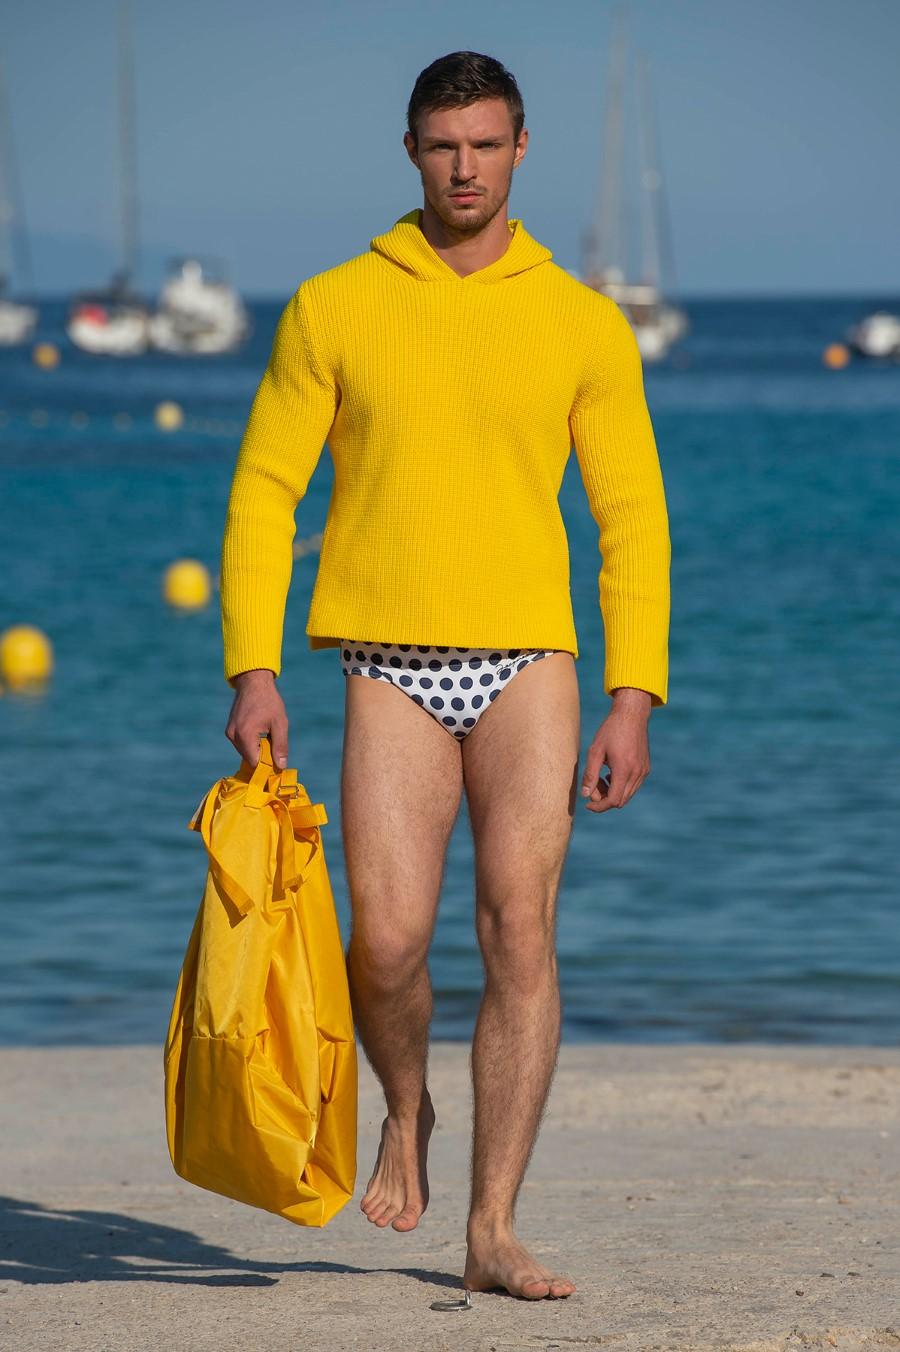 Jacquemus Men's Spring Summer 2019